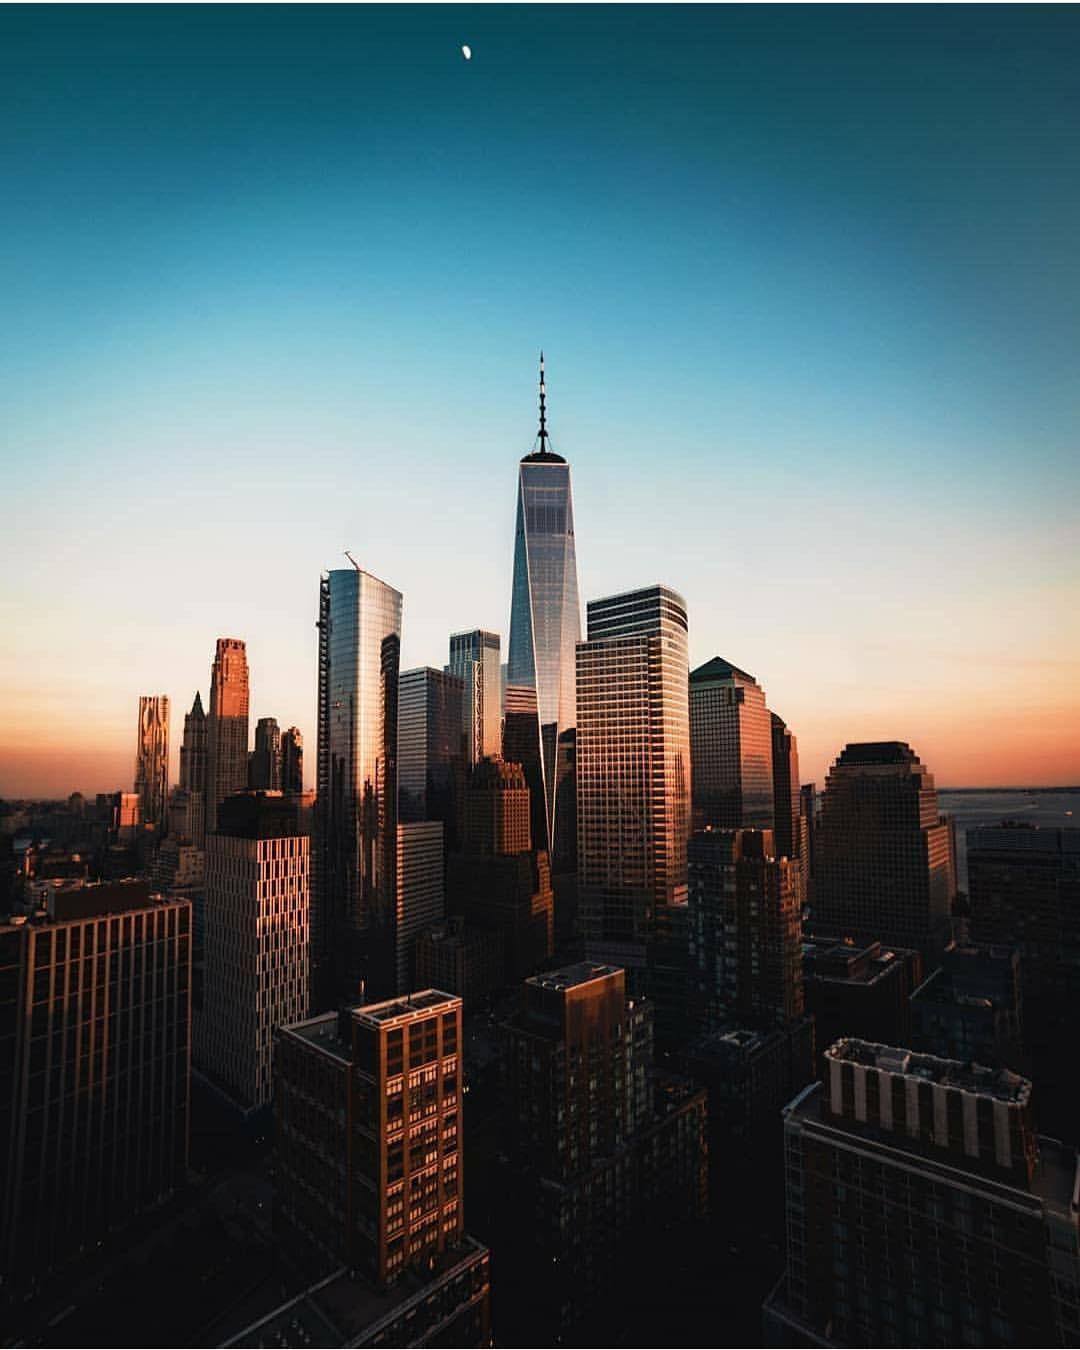 Newyork Newyorkcity Manhattan Nyc Ilovenesyork Newyorkphotography Photography City Aesthetic City Photography City Landscape